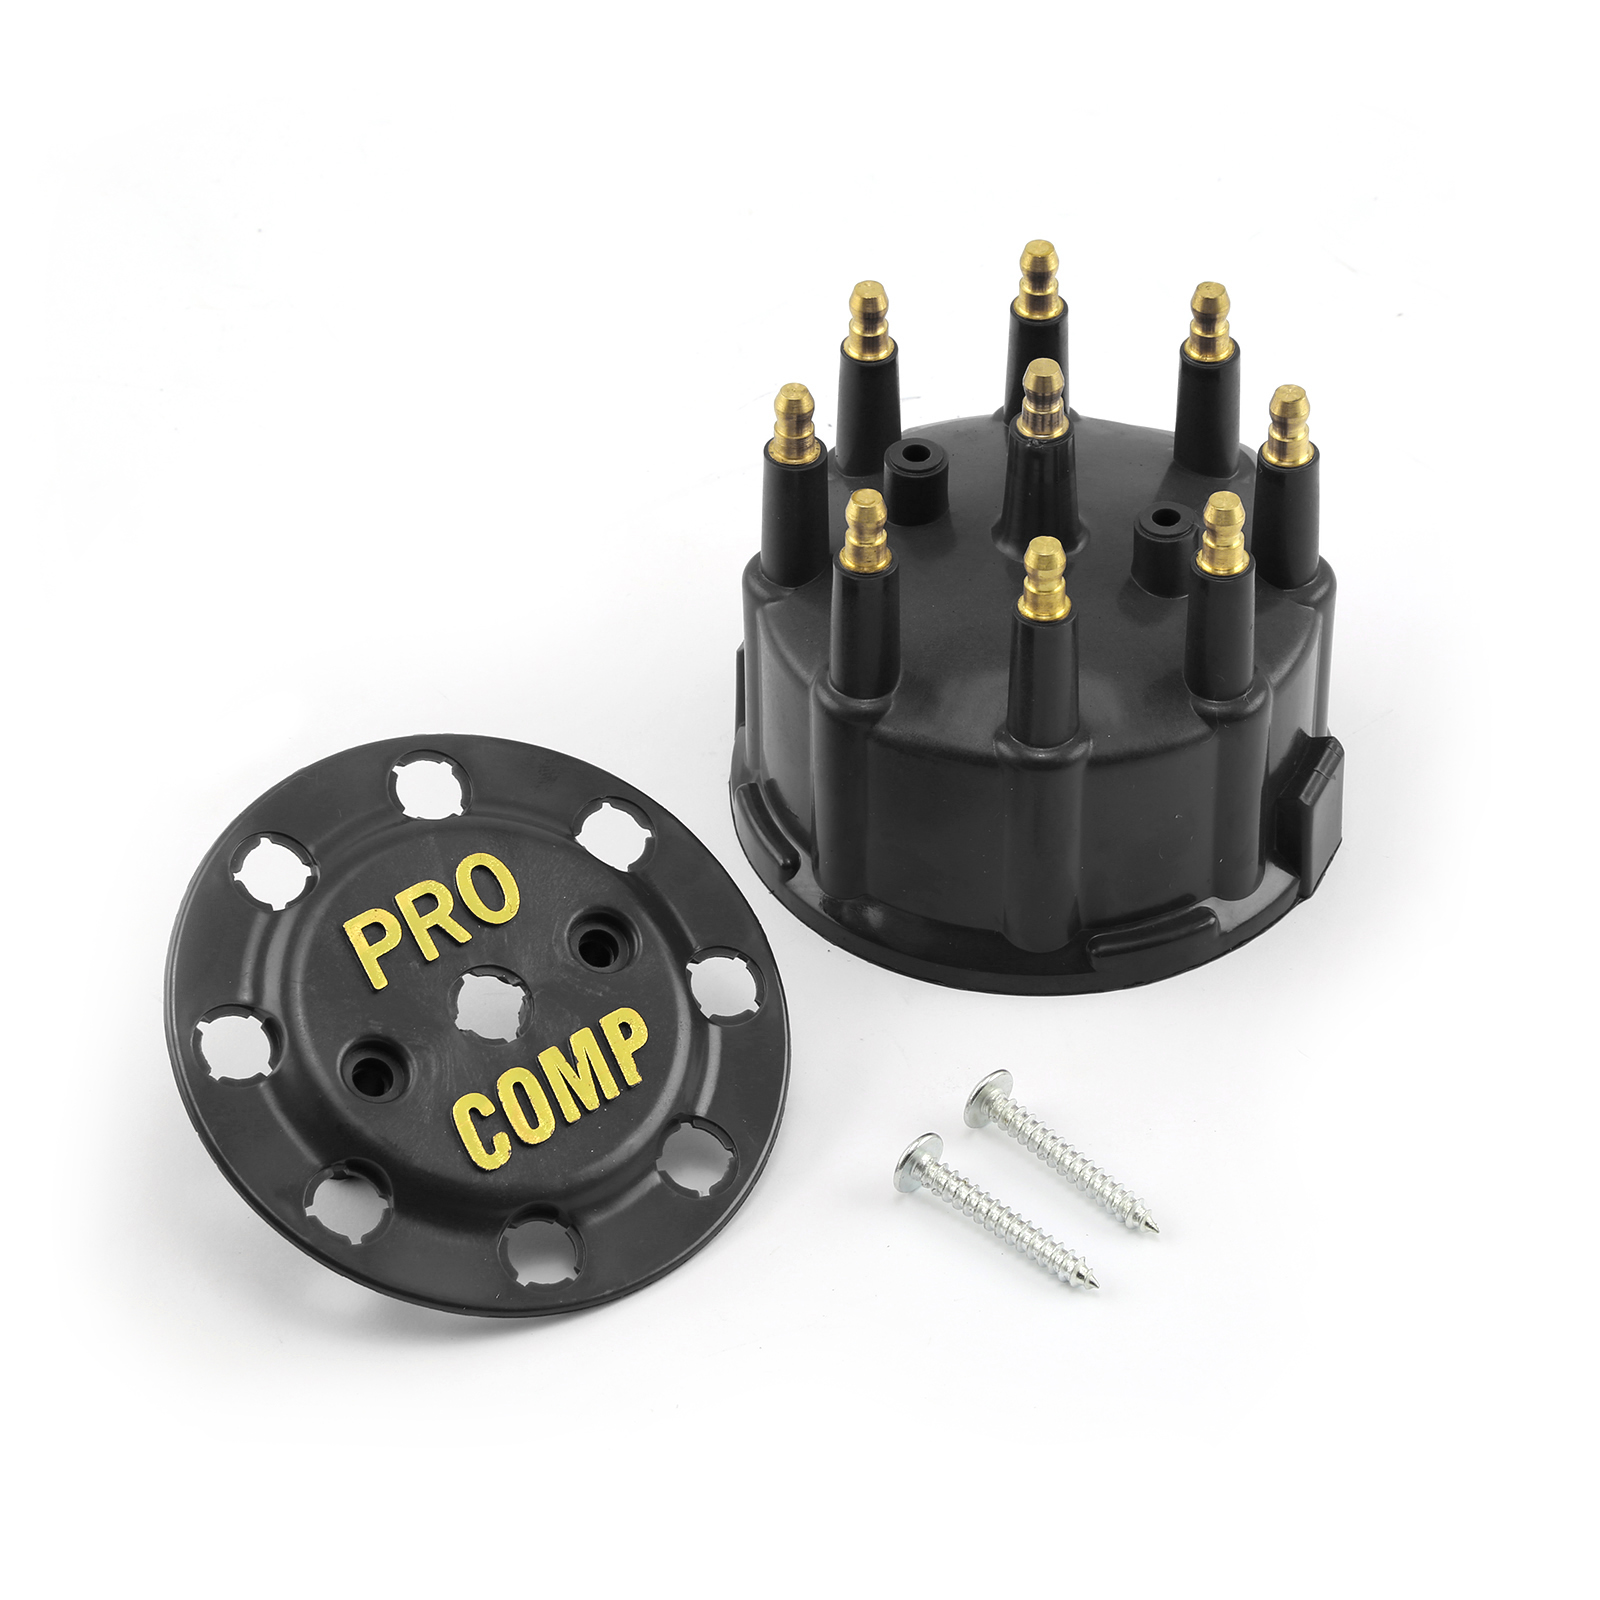 7000 and 8000 Series Male 90.2 Distributor Cap - Black